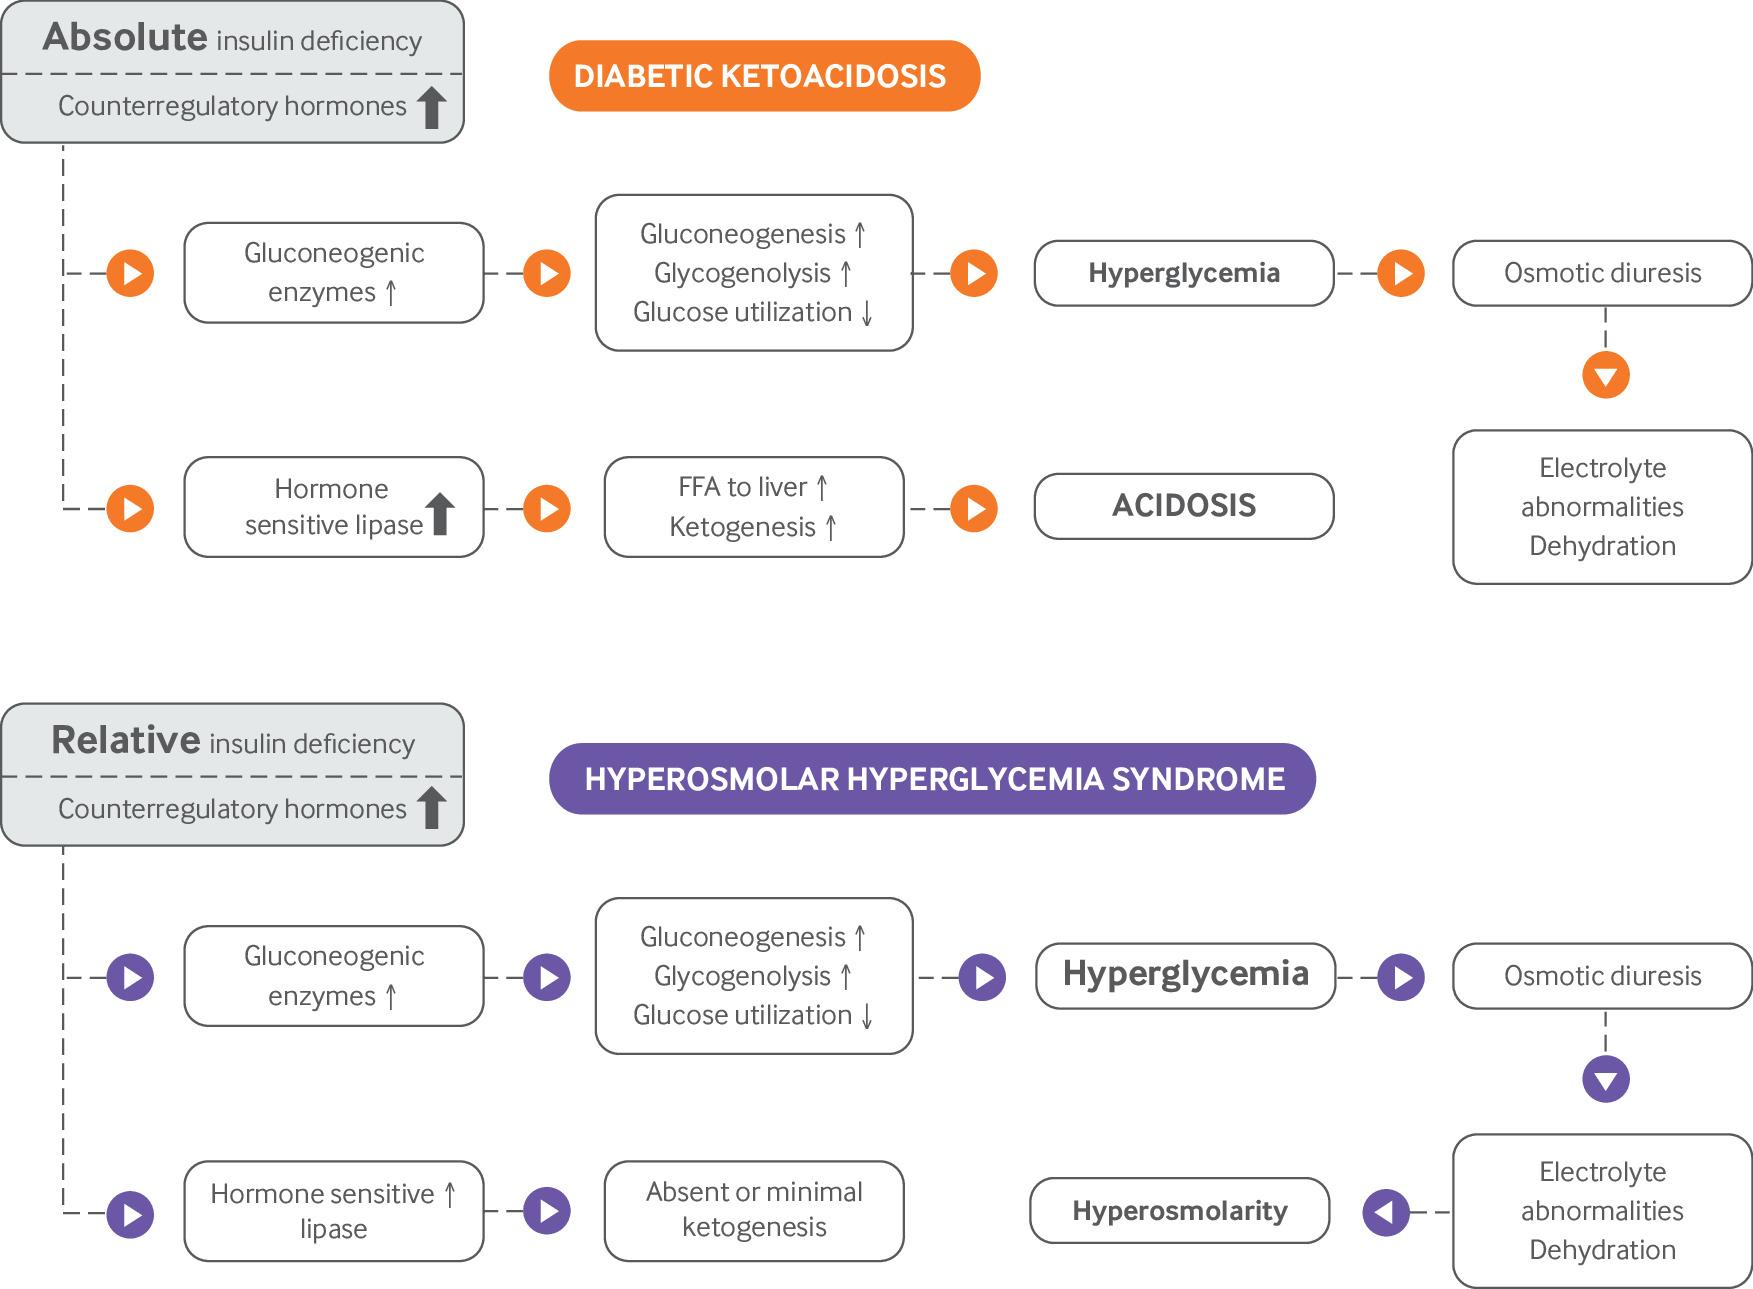 Diabetic ketoacidosis and hyperosmolar hyperglycemic